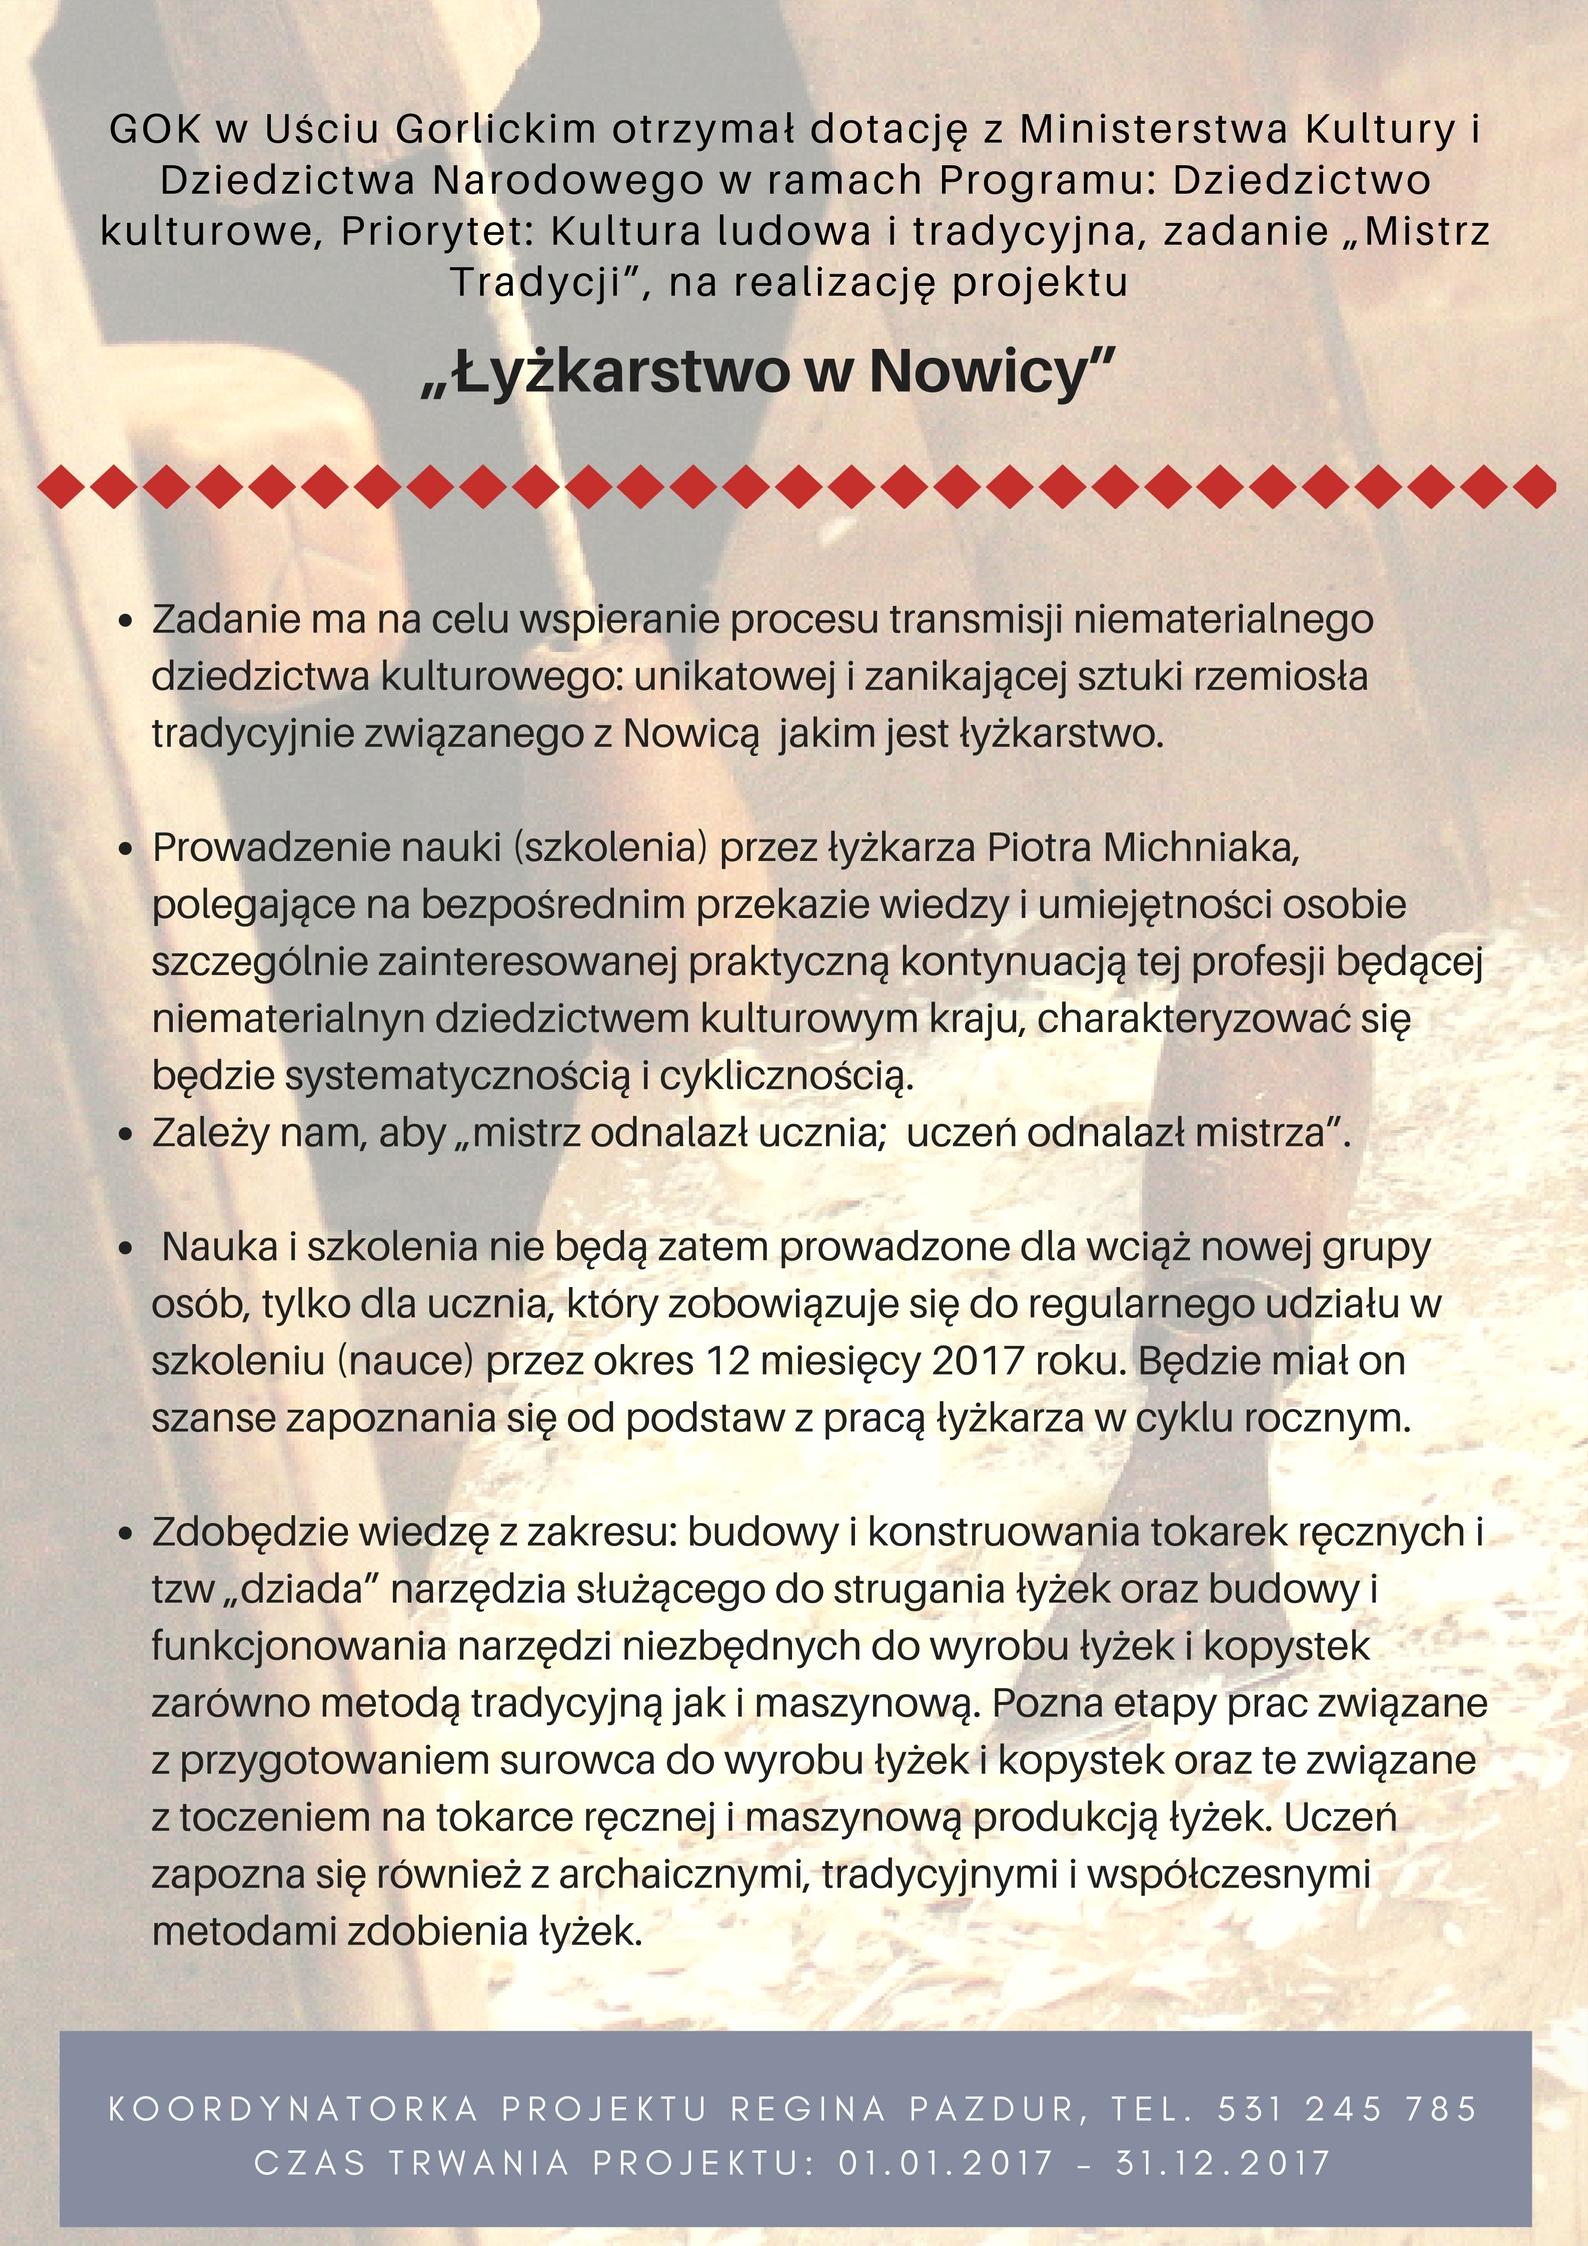 info_plakat1_gok